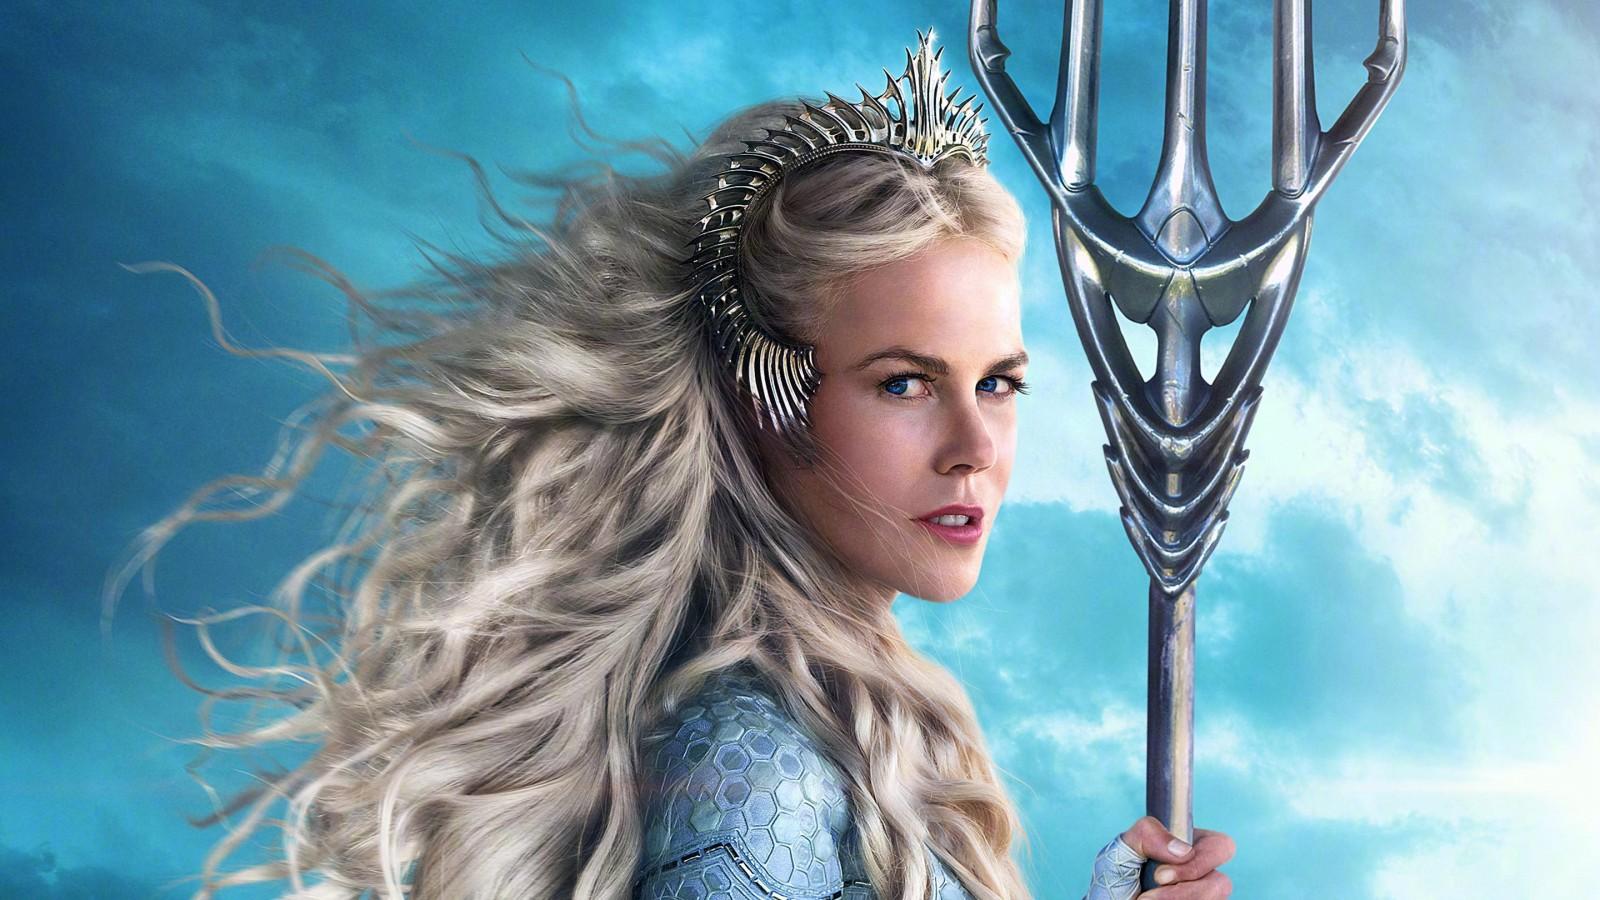 Wallpapers For Windows 7 Cute Nicole Kidman As Queen Atlanna In Aquaman Wallpapers Hd